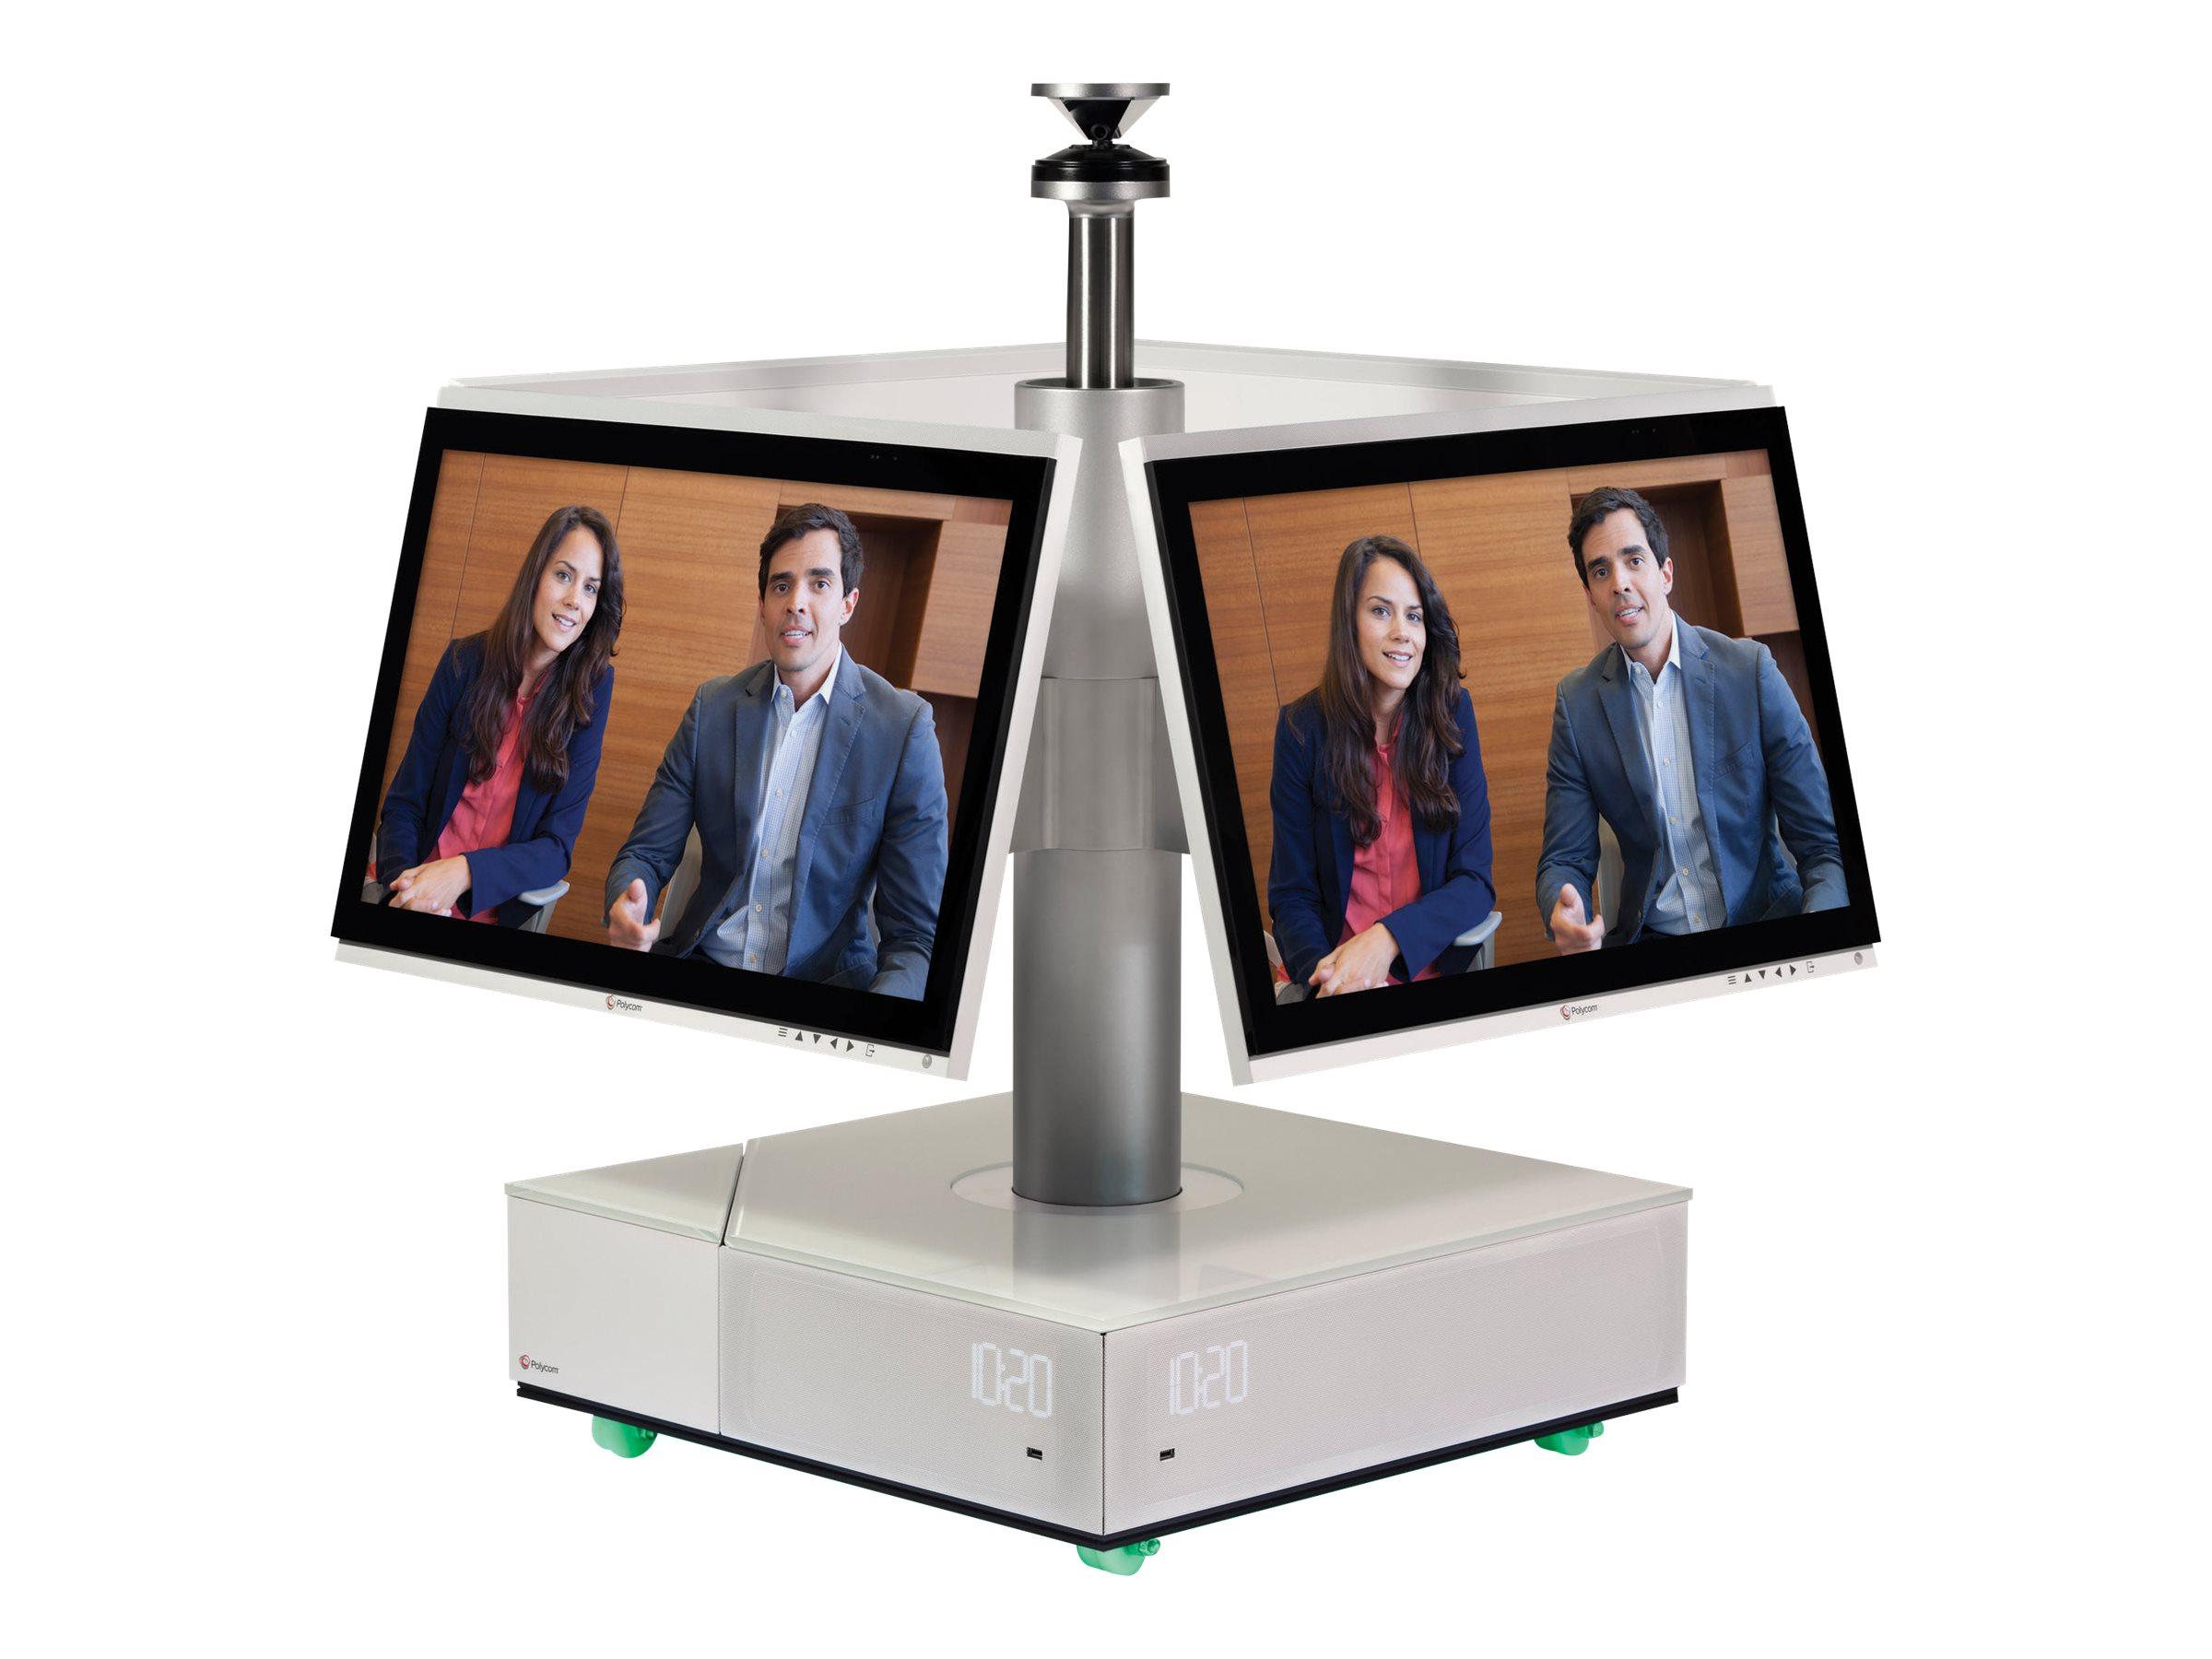 Polycom RealPresence Centro - Kit für Videokonferenzen - 27 Zoll